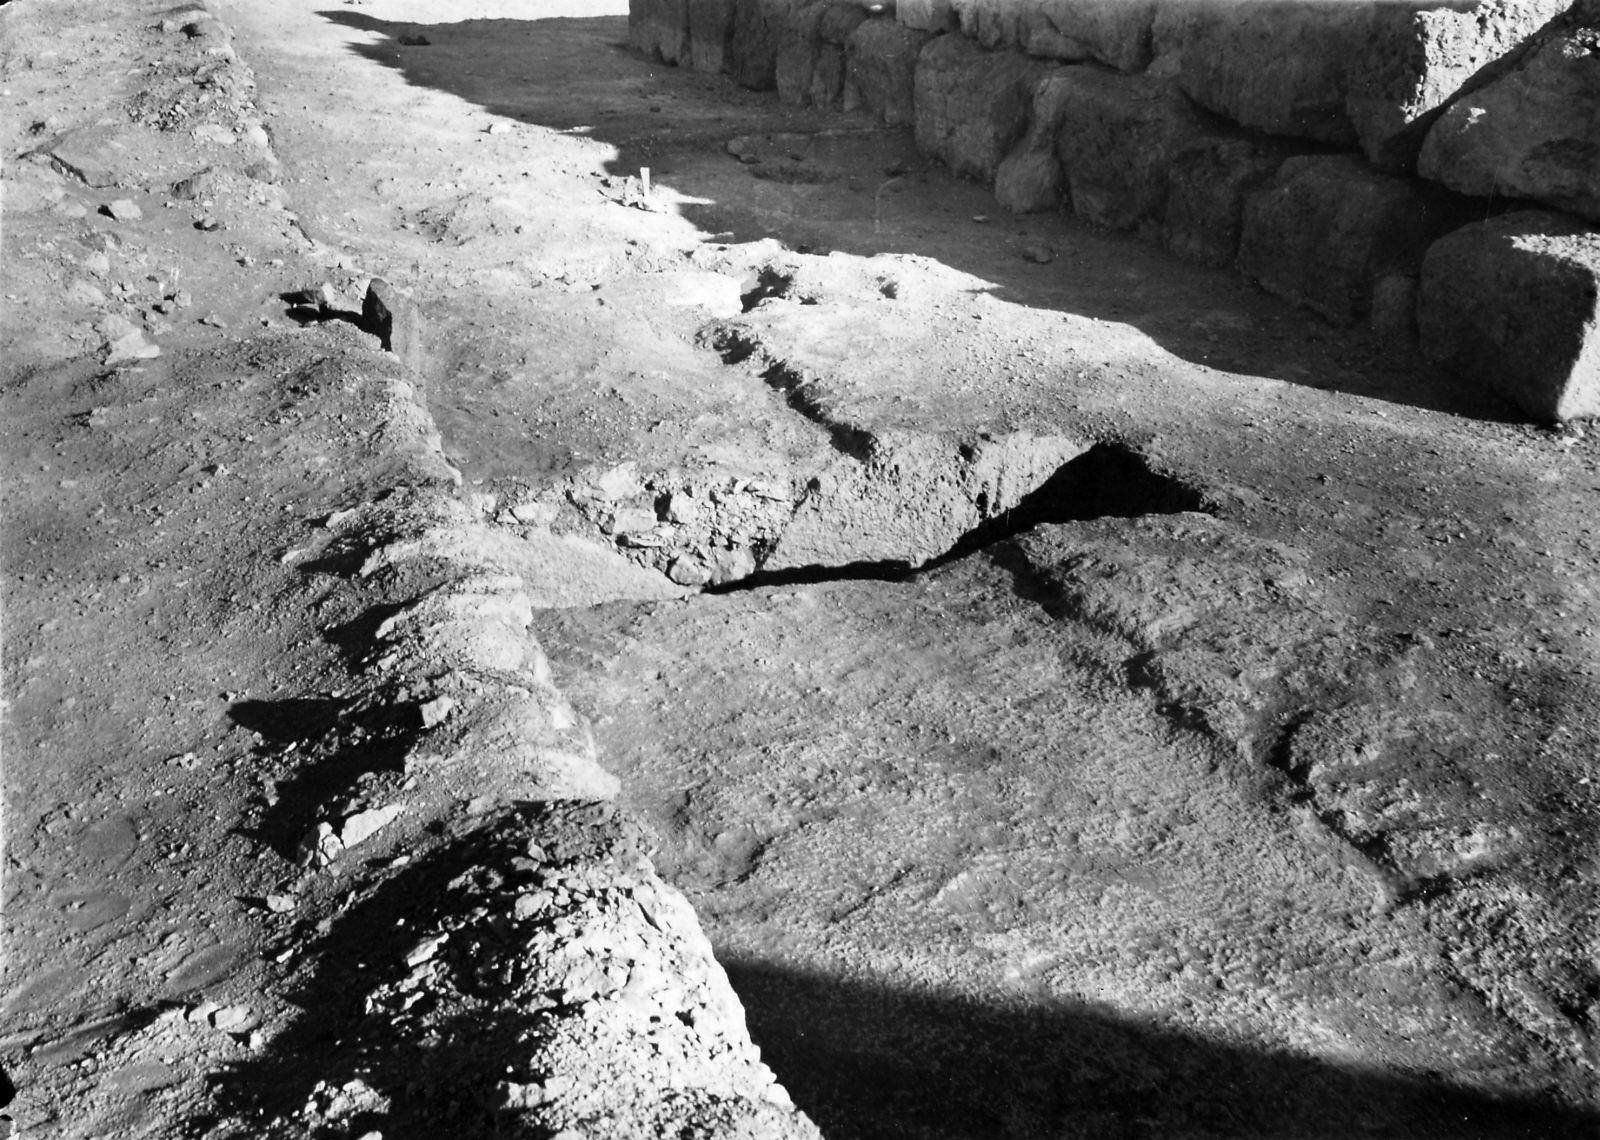 Khufu Pyramid Complex: Site: Giza; View: Mastaba VIII, Khufu Pyramid Enclosure Wall